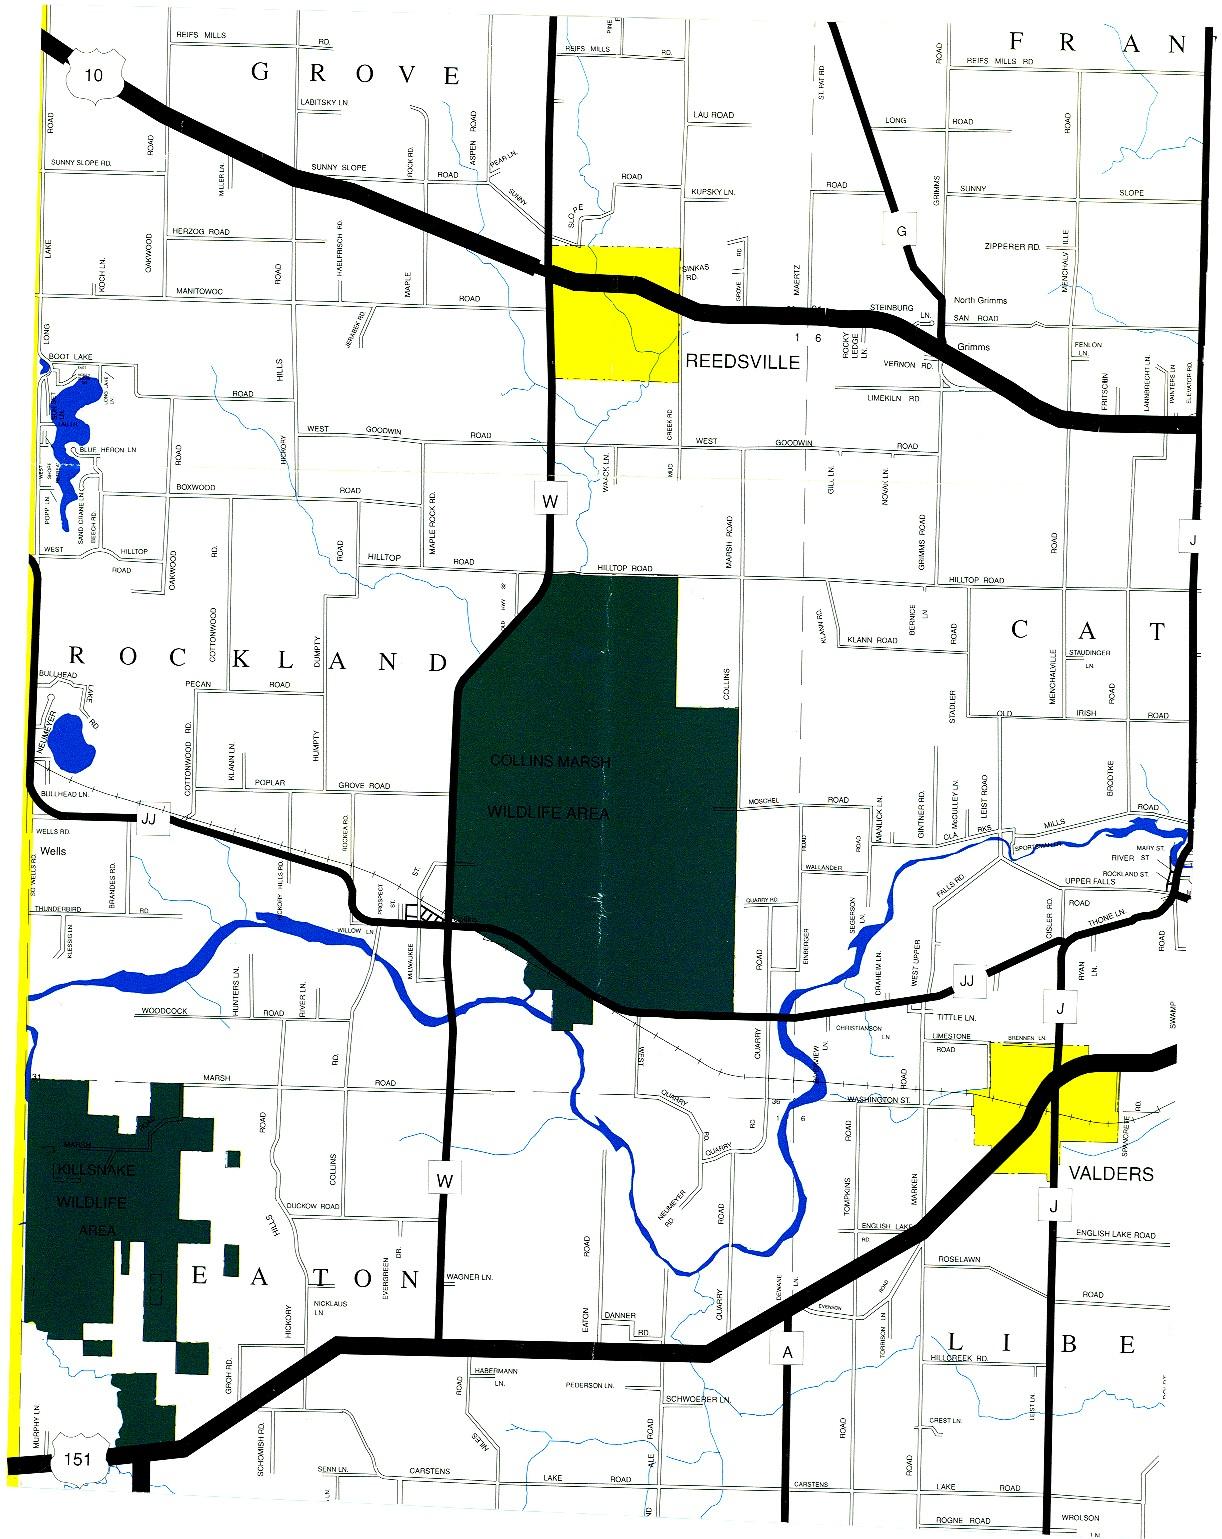 fire distrcit borderlines map